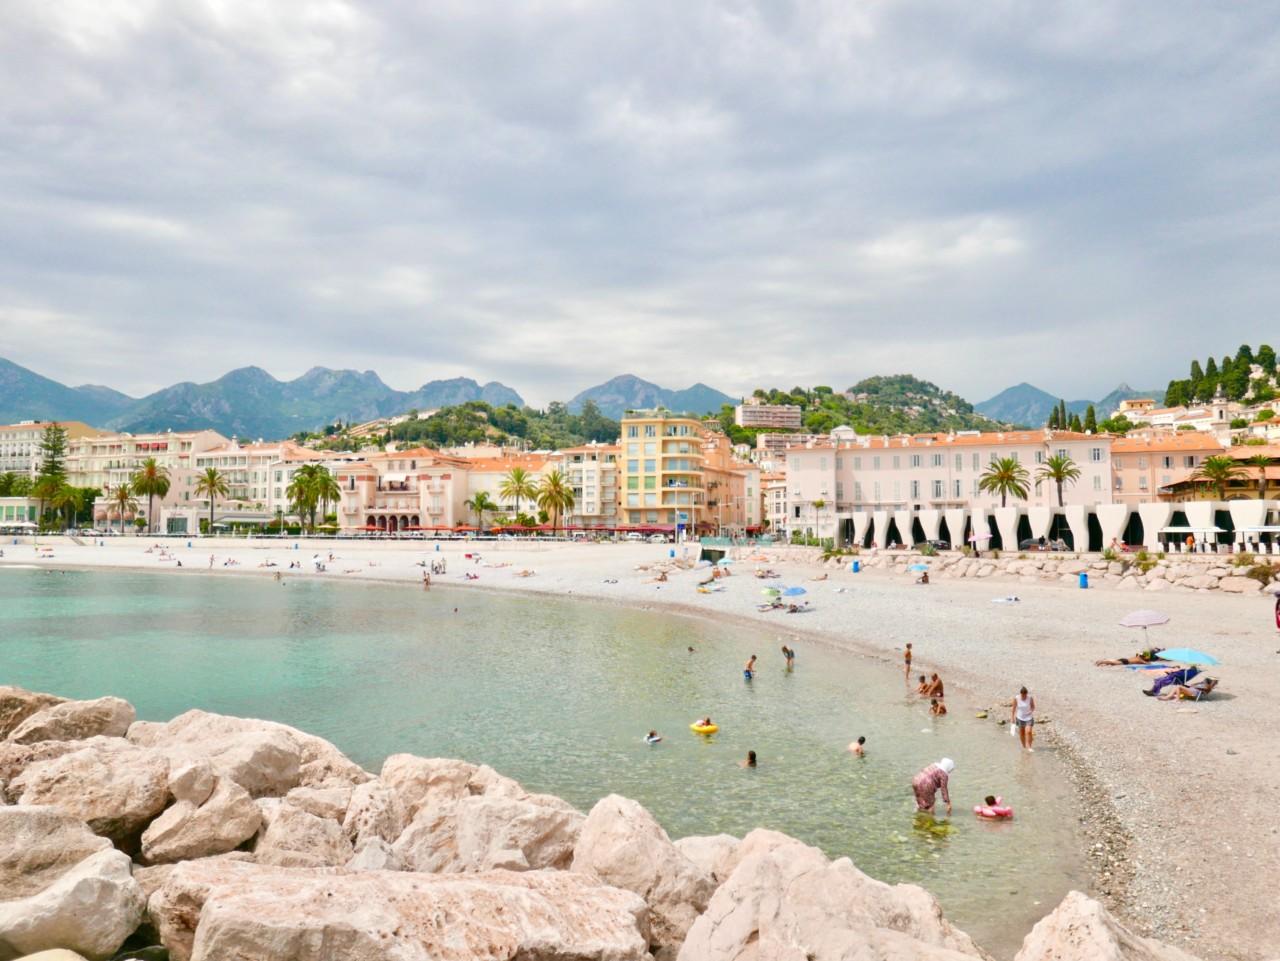 rullesteinsstranden-menton-plage-public-beach-green-house